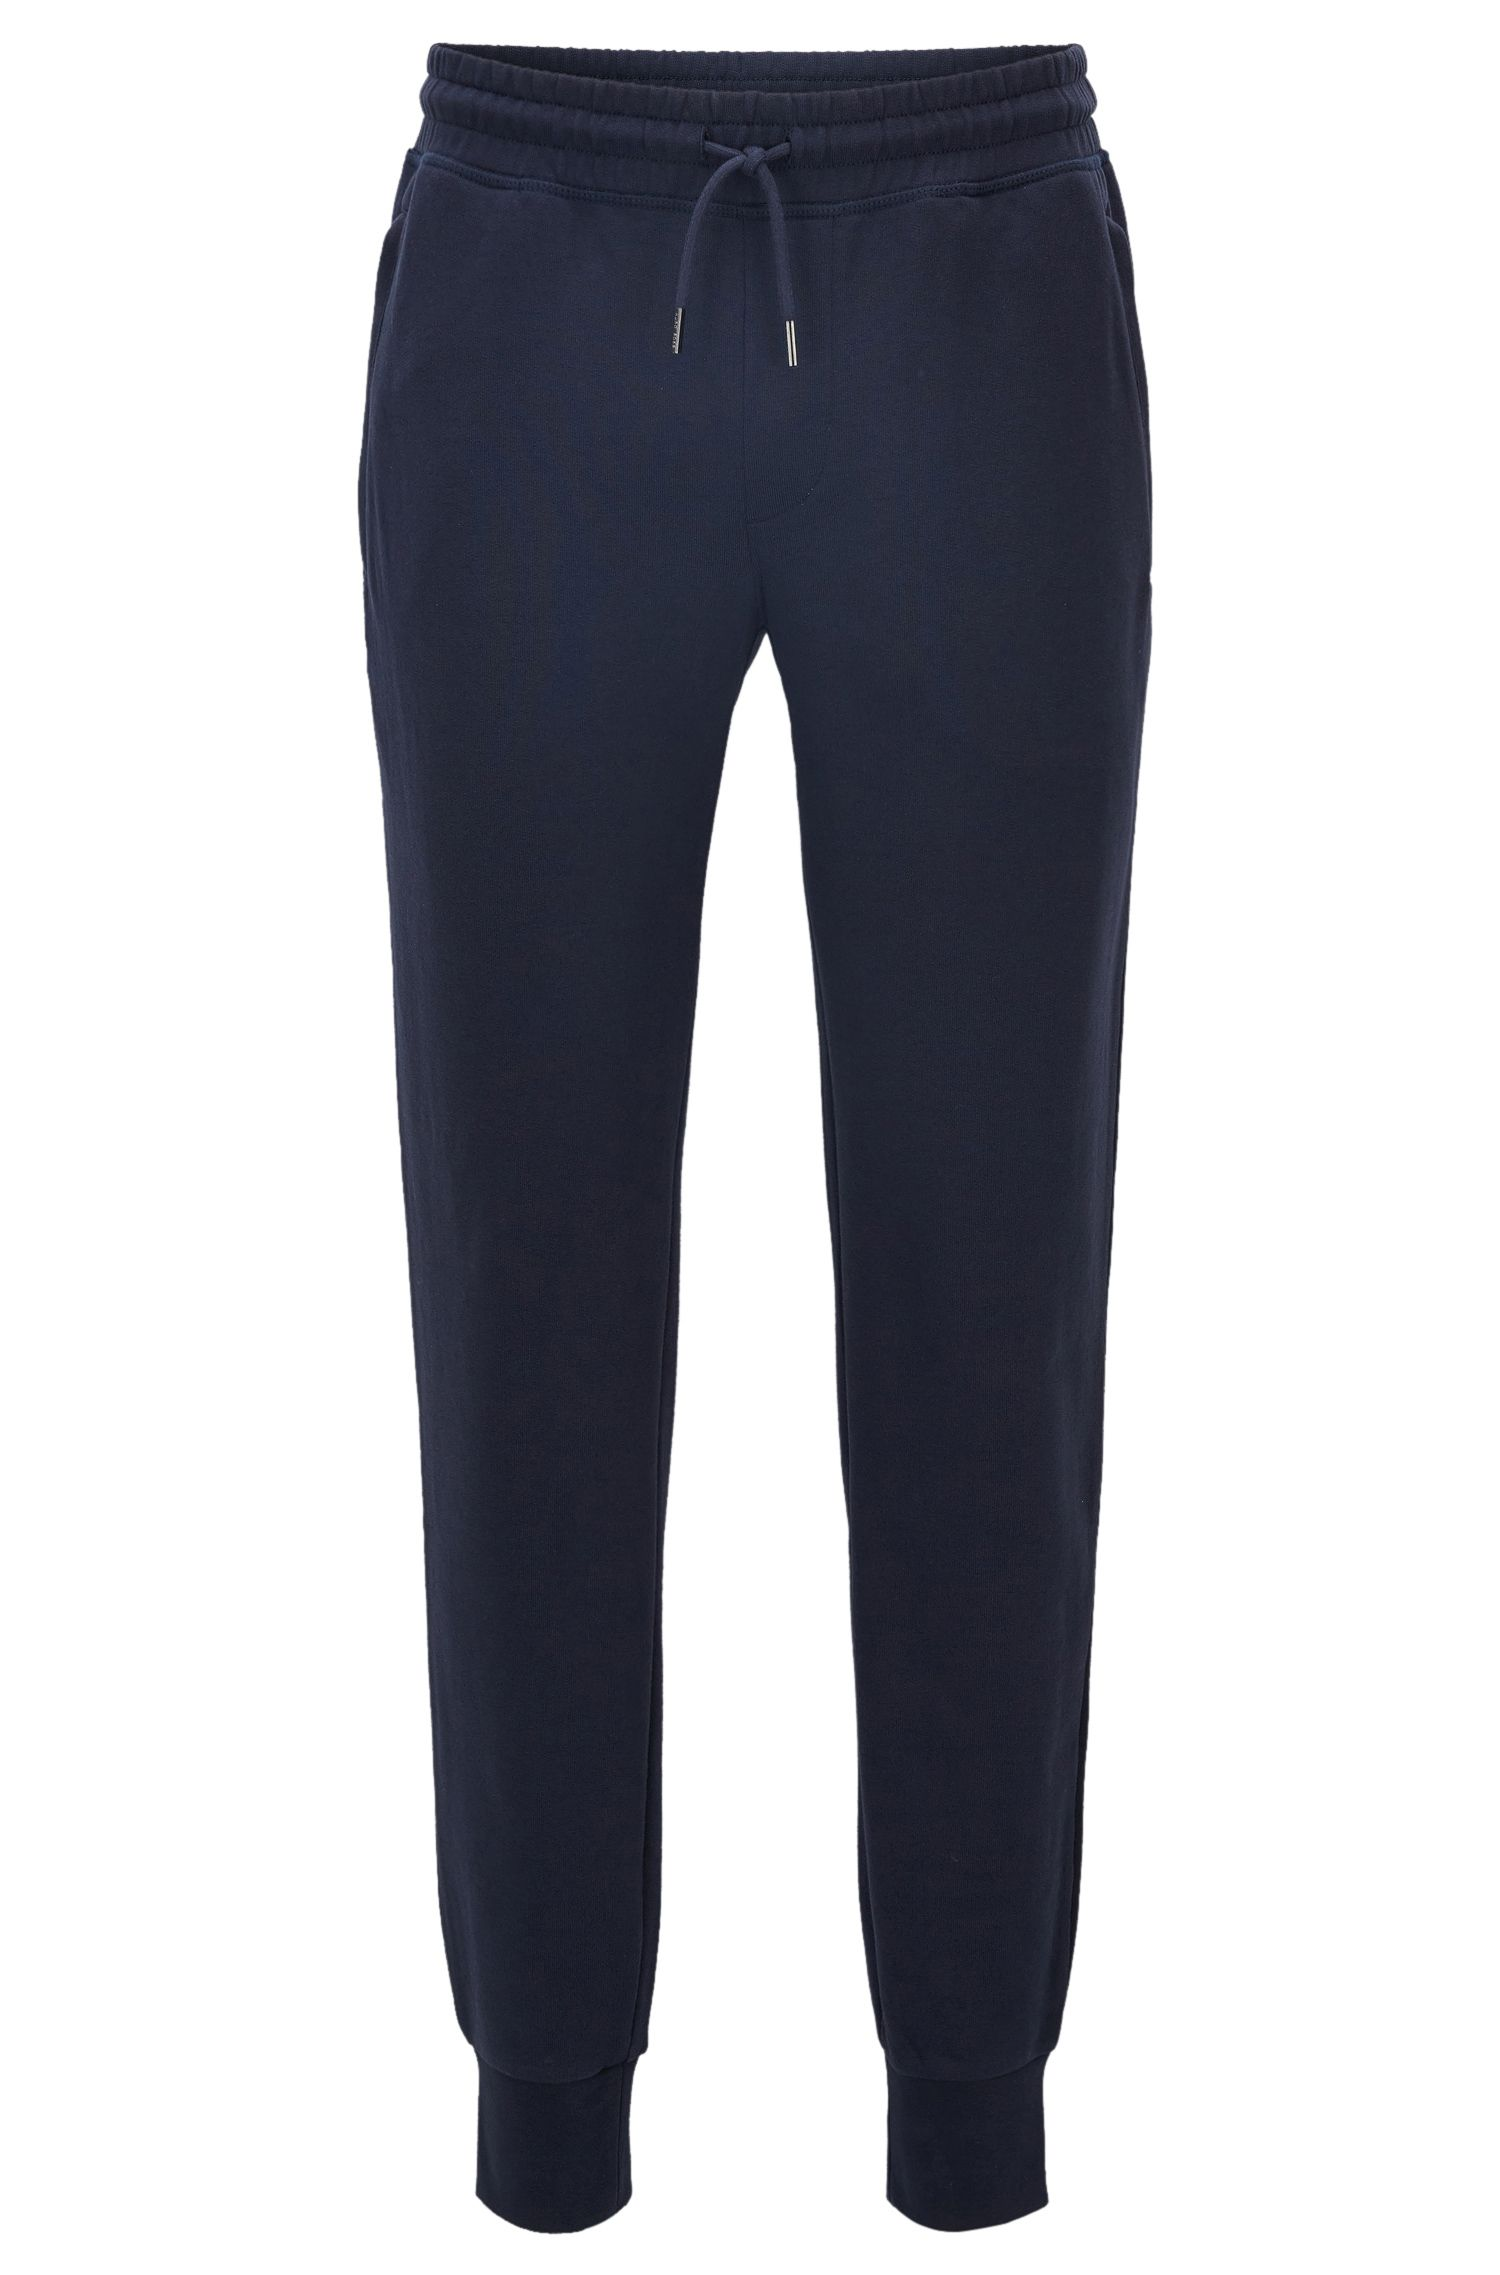 Pantalon Regular Fit en molleton Terry de coton